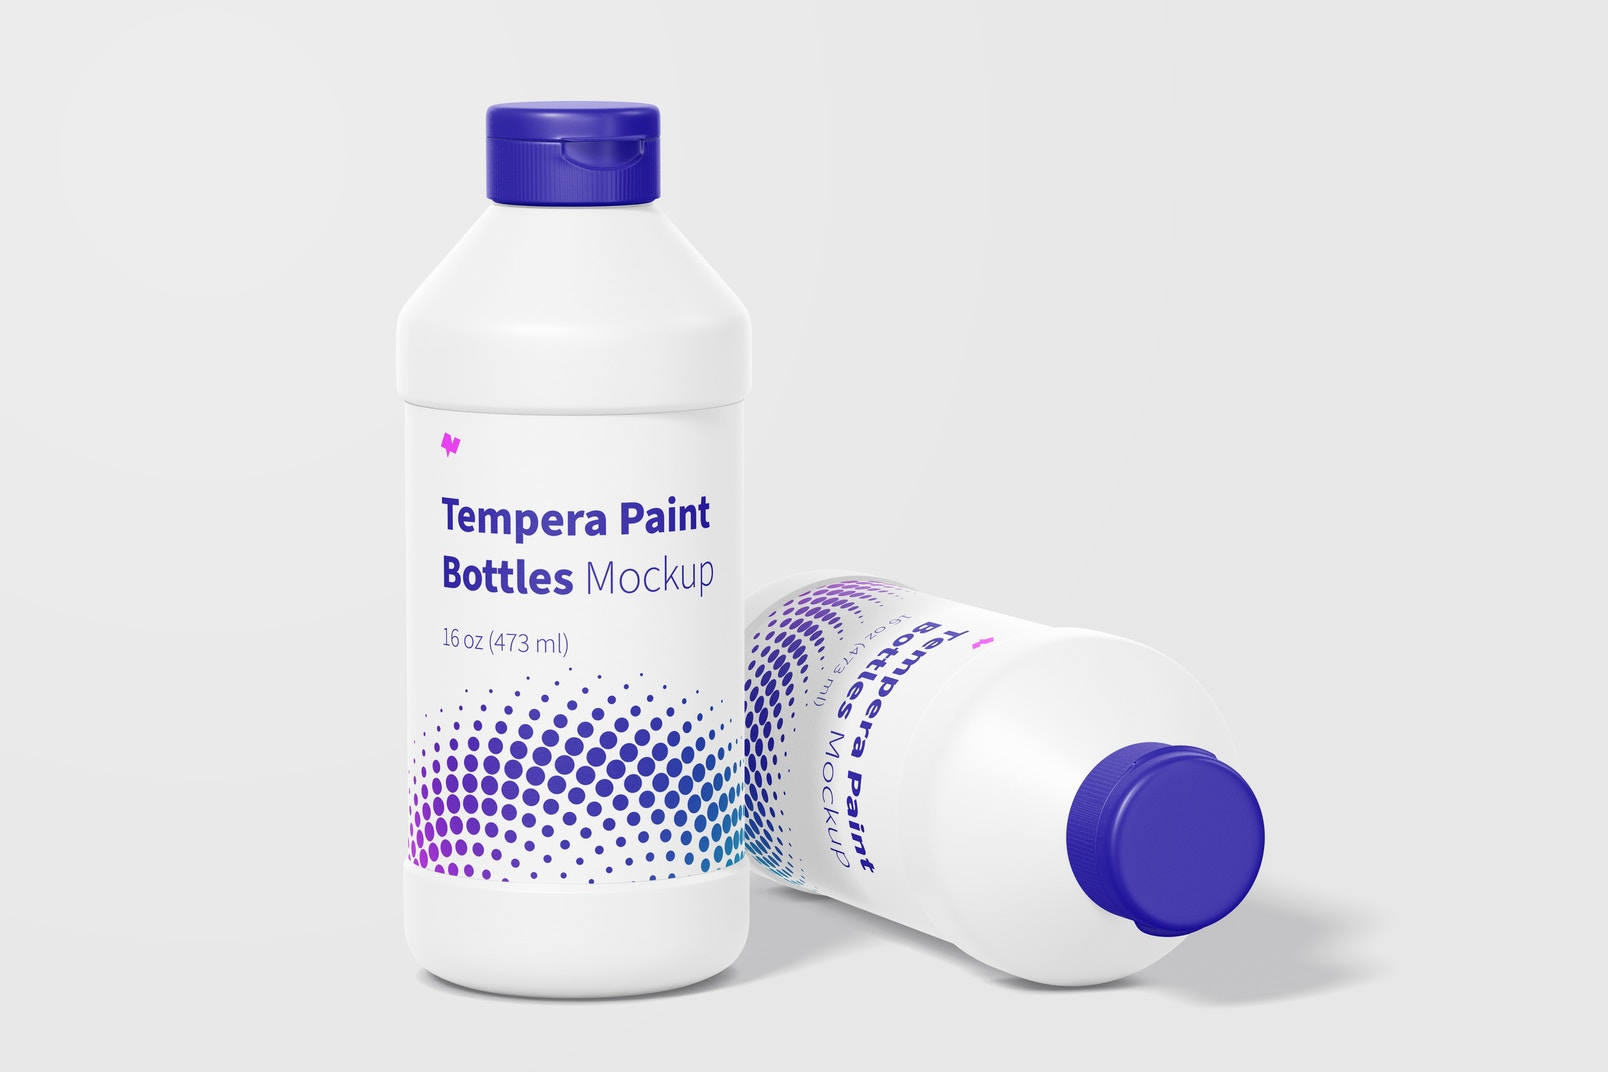 16 oz Tempera Paint Bottles Mockup